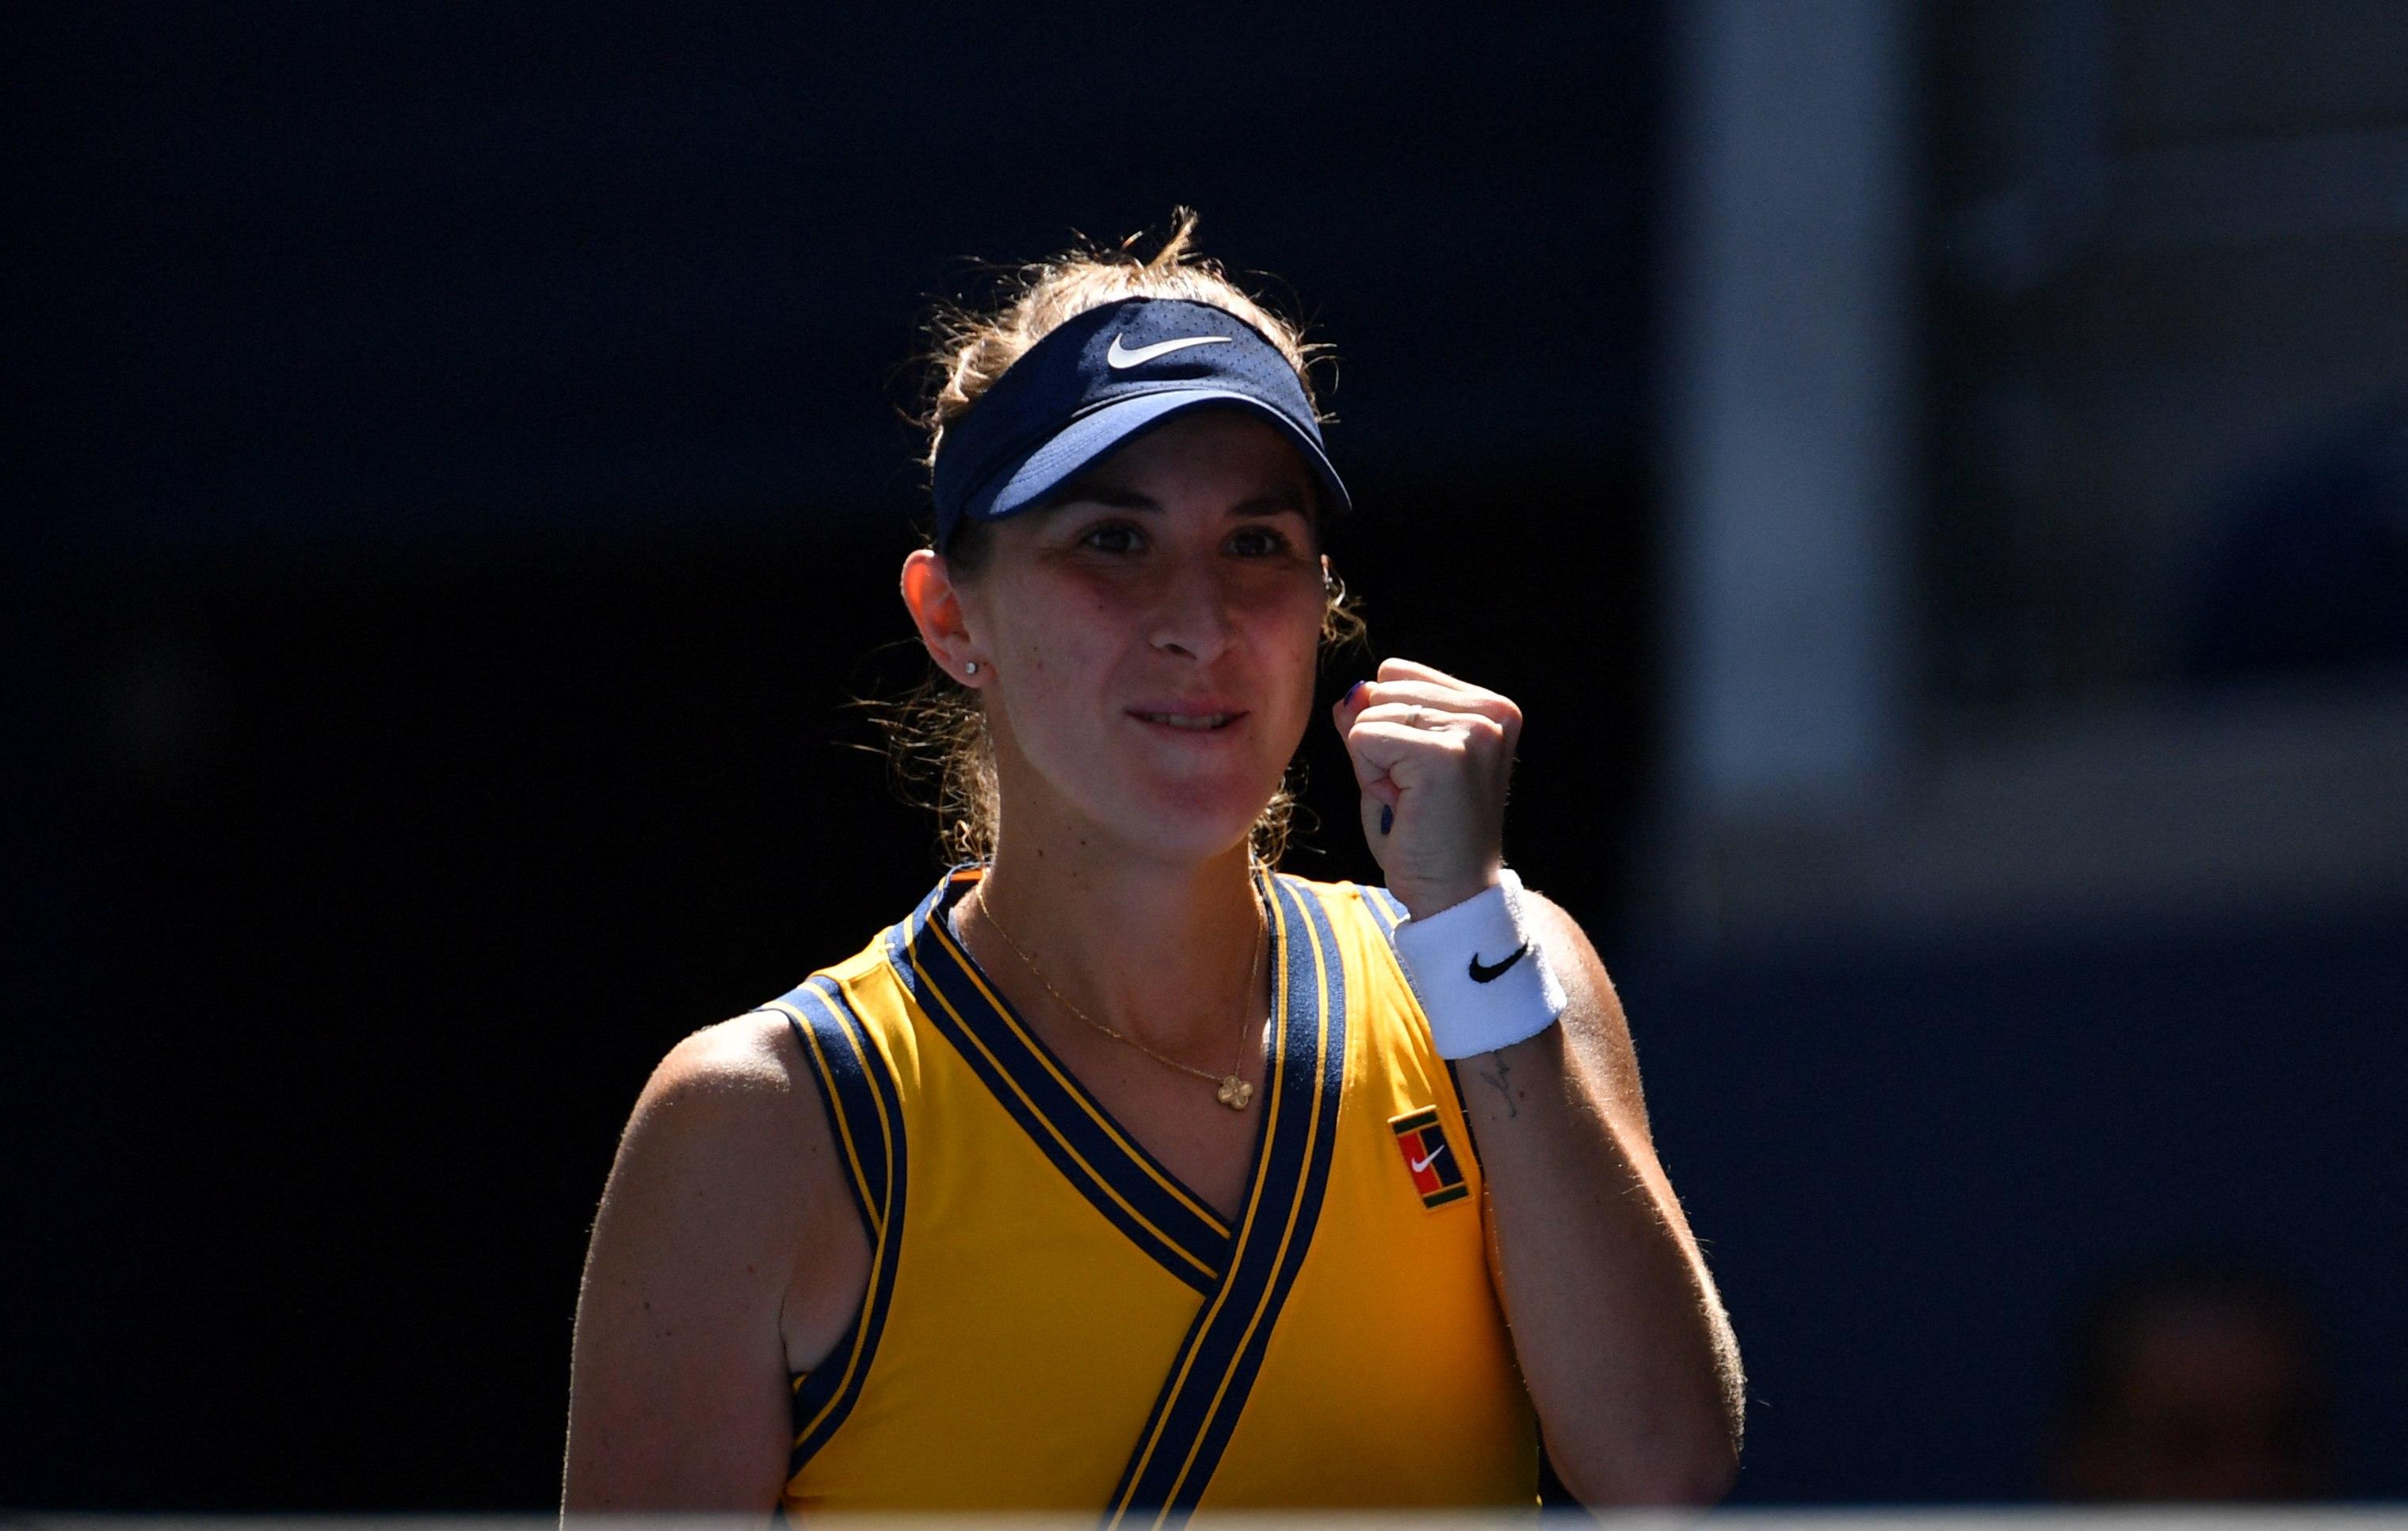 From Luxembourg through Indian Wells, Belinda Bencic aiming to make push towards WTA Finals return | Tennis.com